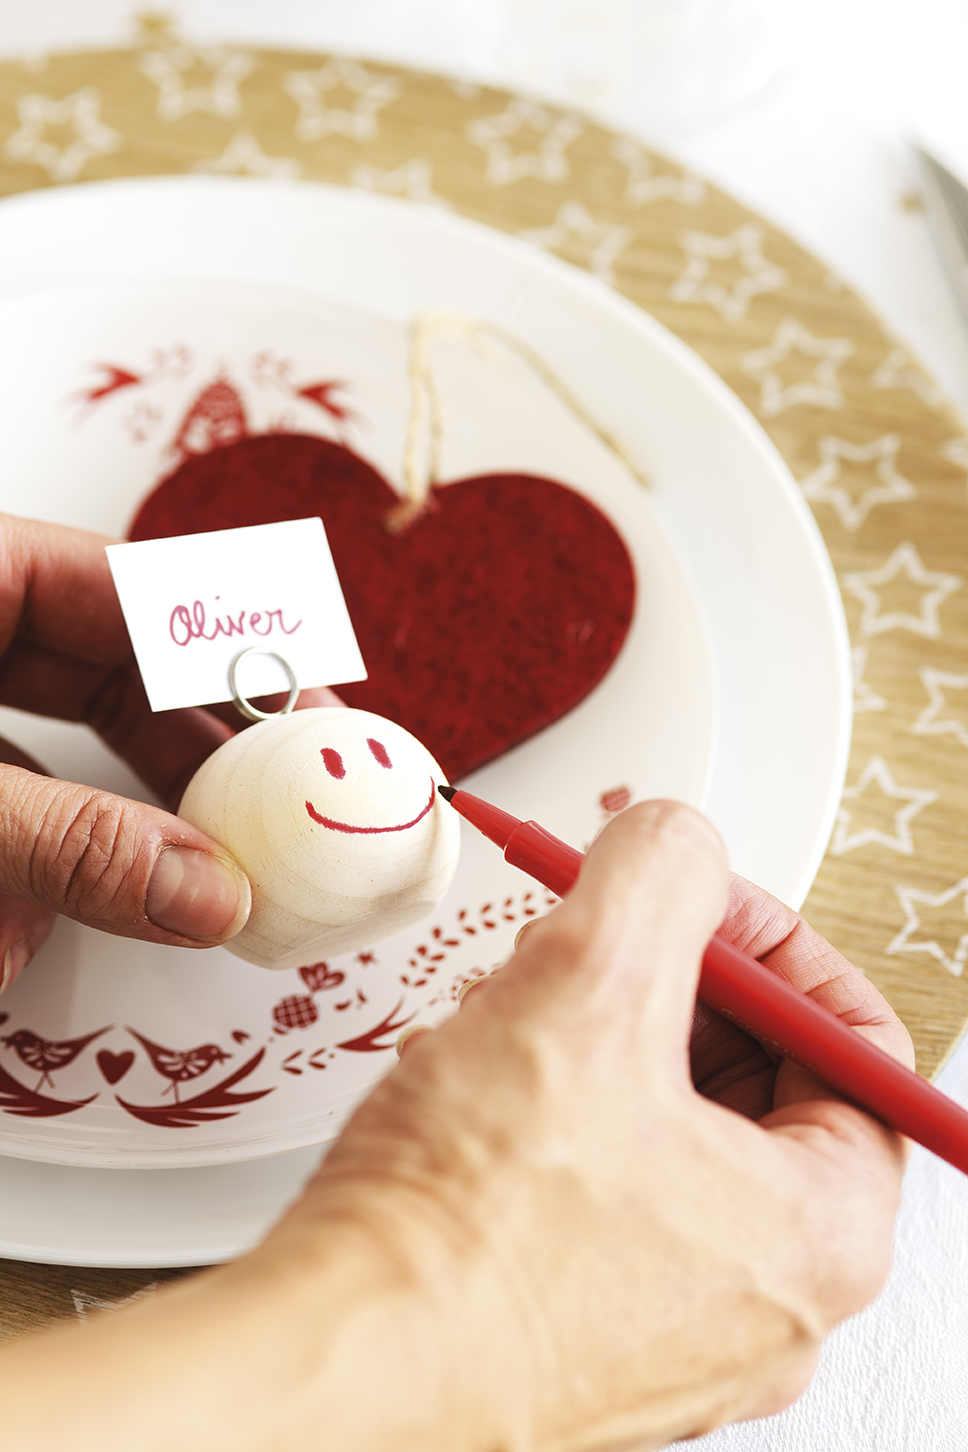 Detalles para decorar la mesa de navidad - Detalles para decorar la casa ...